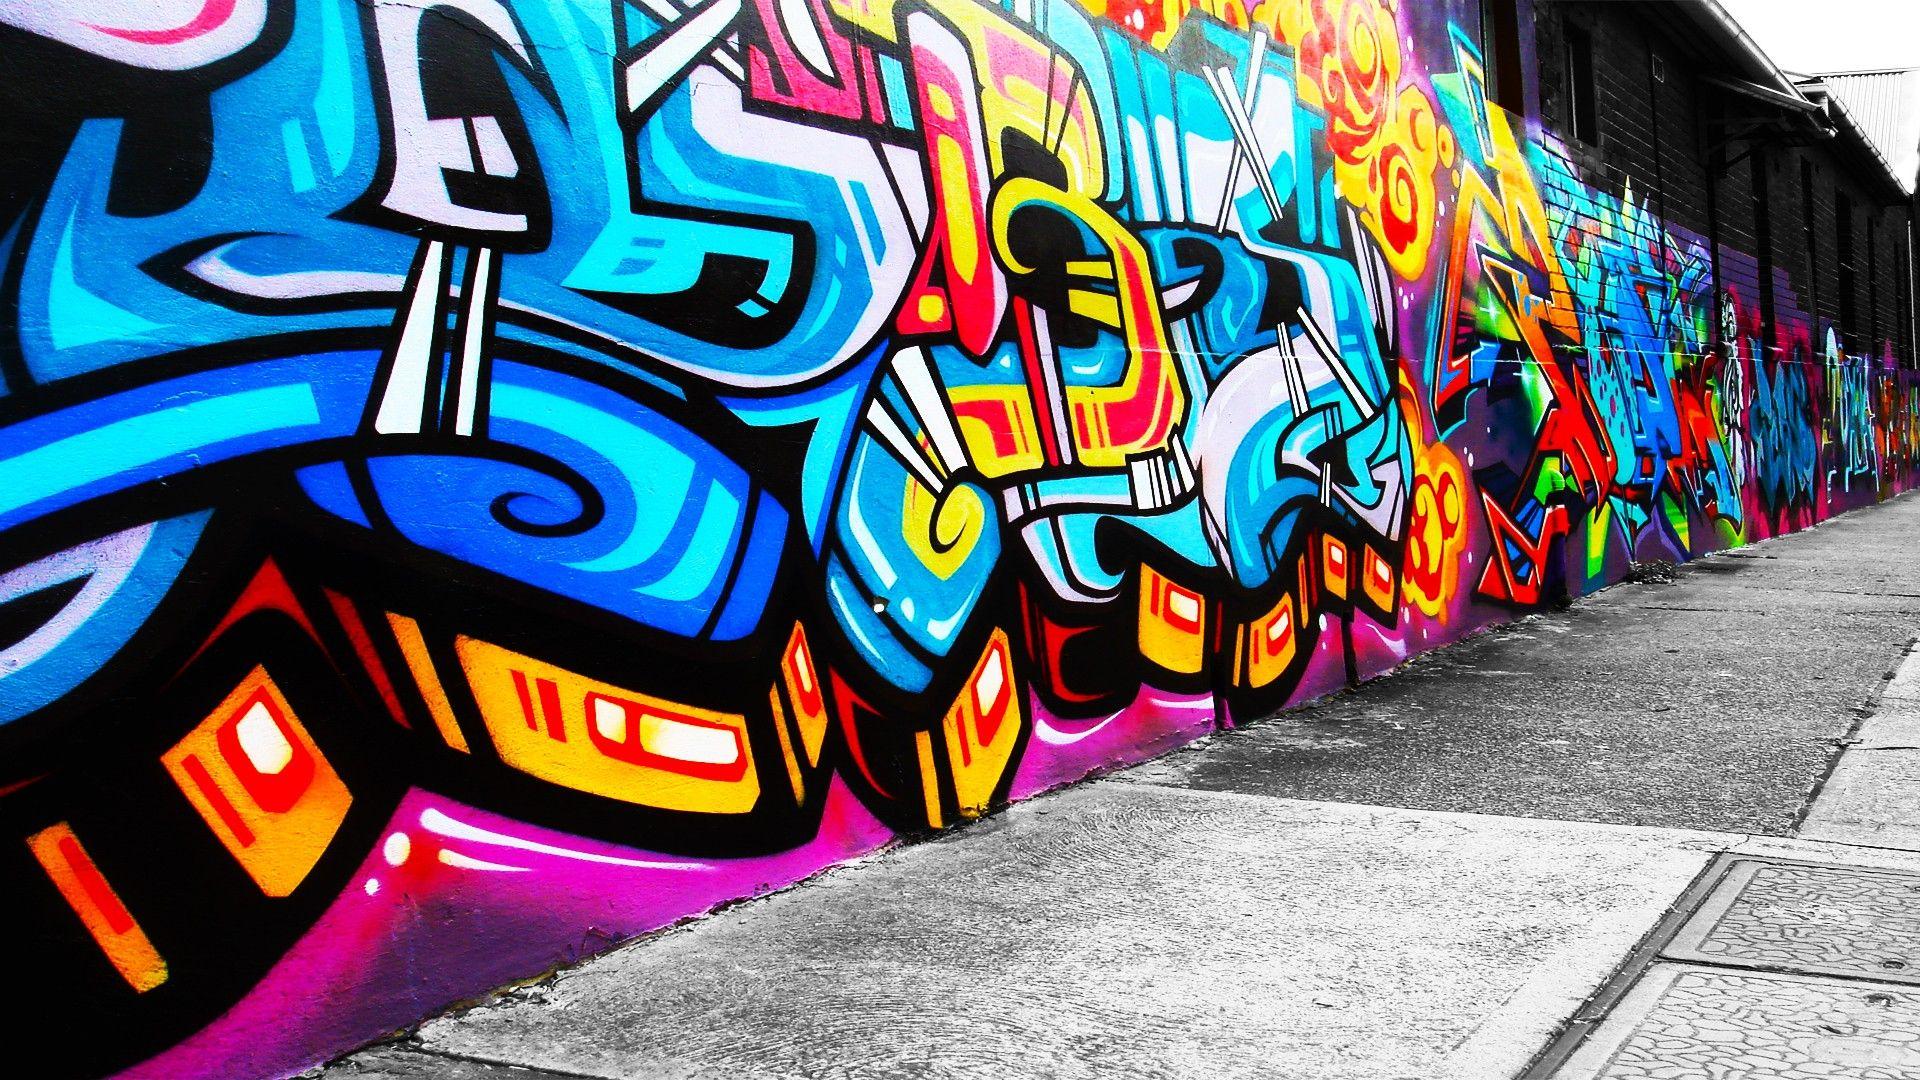 404 Not Found Graffiti Wall Art Graffiti Wallpaper Street Graffiti